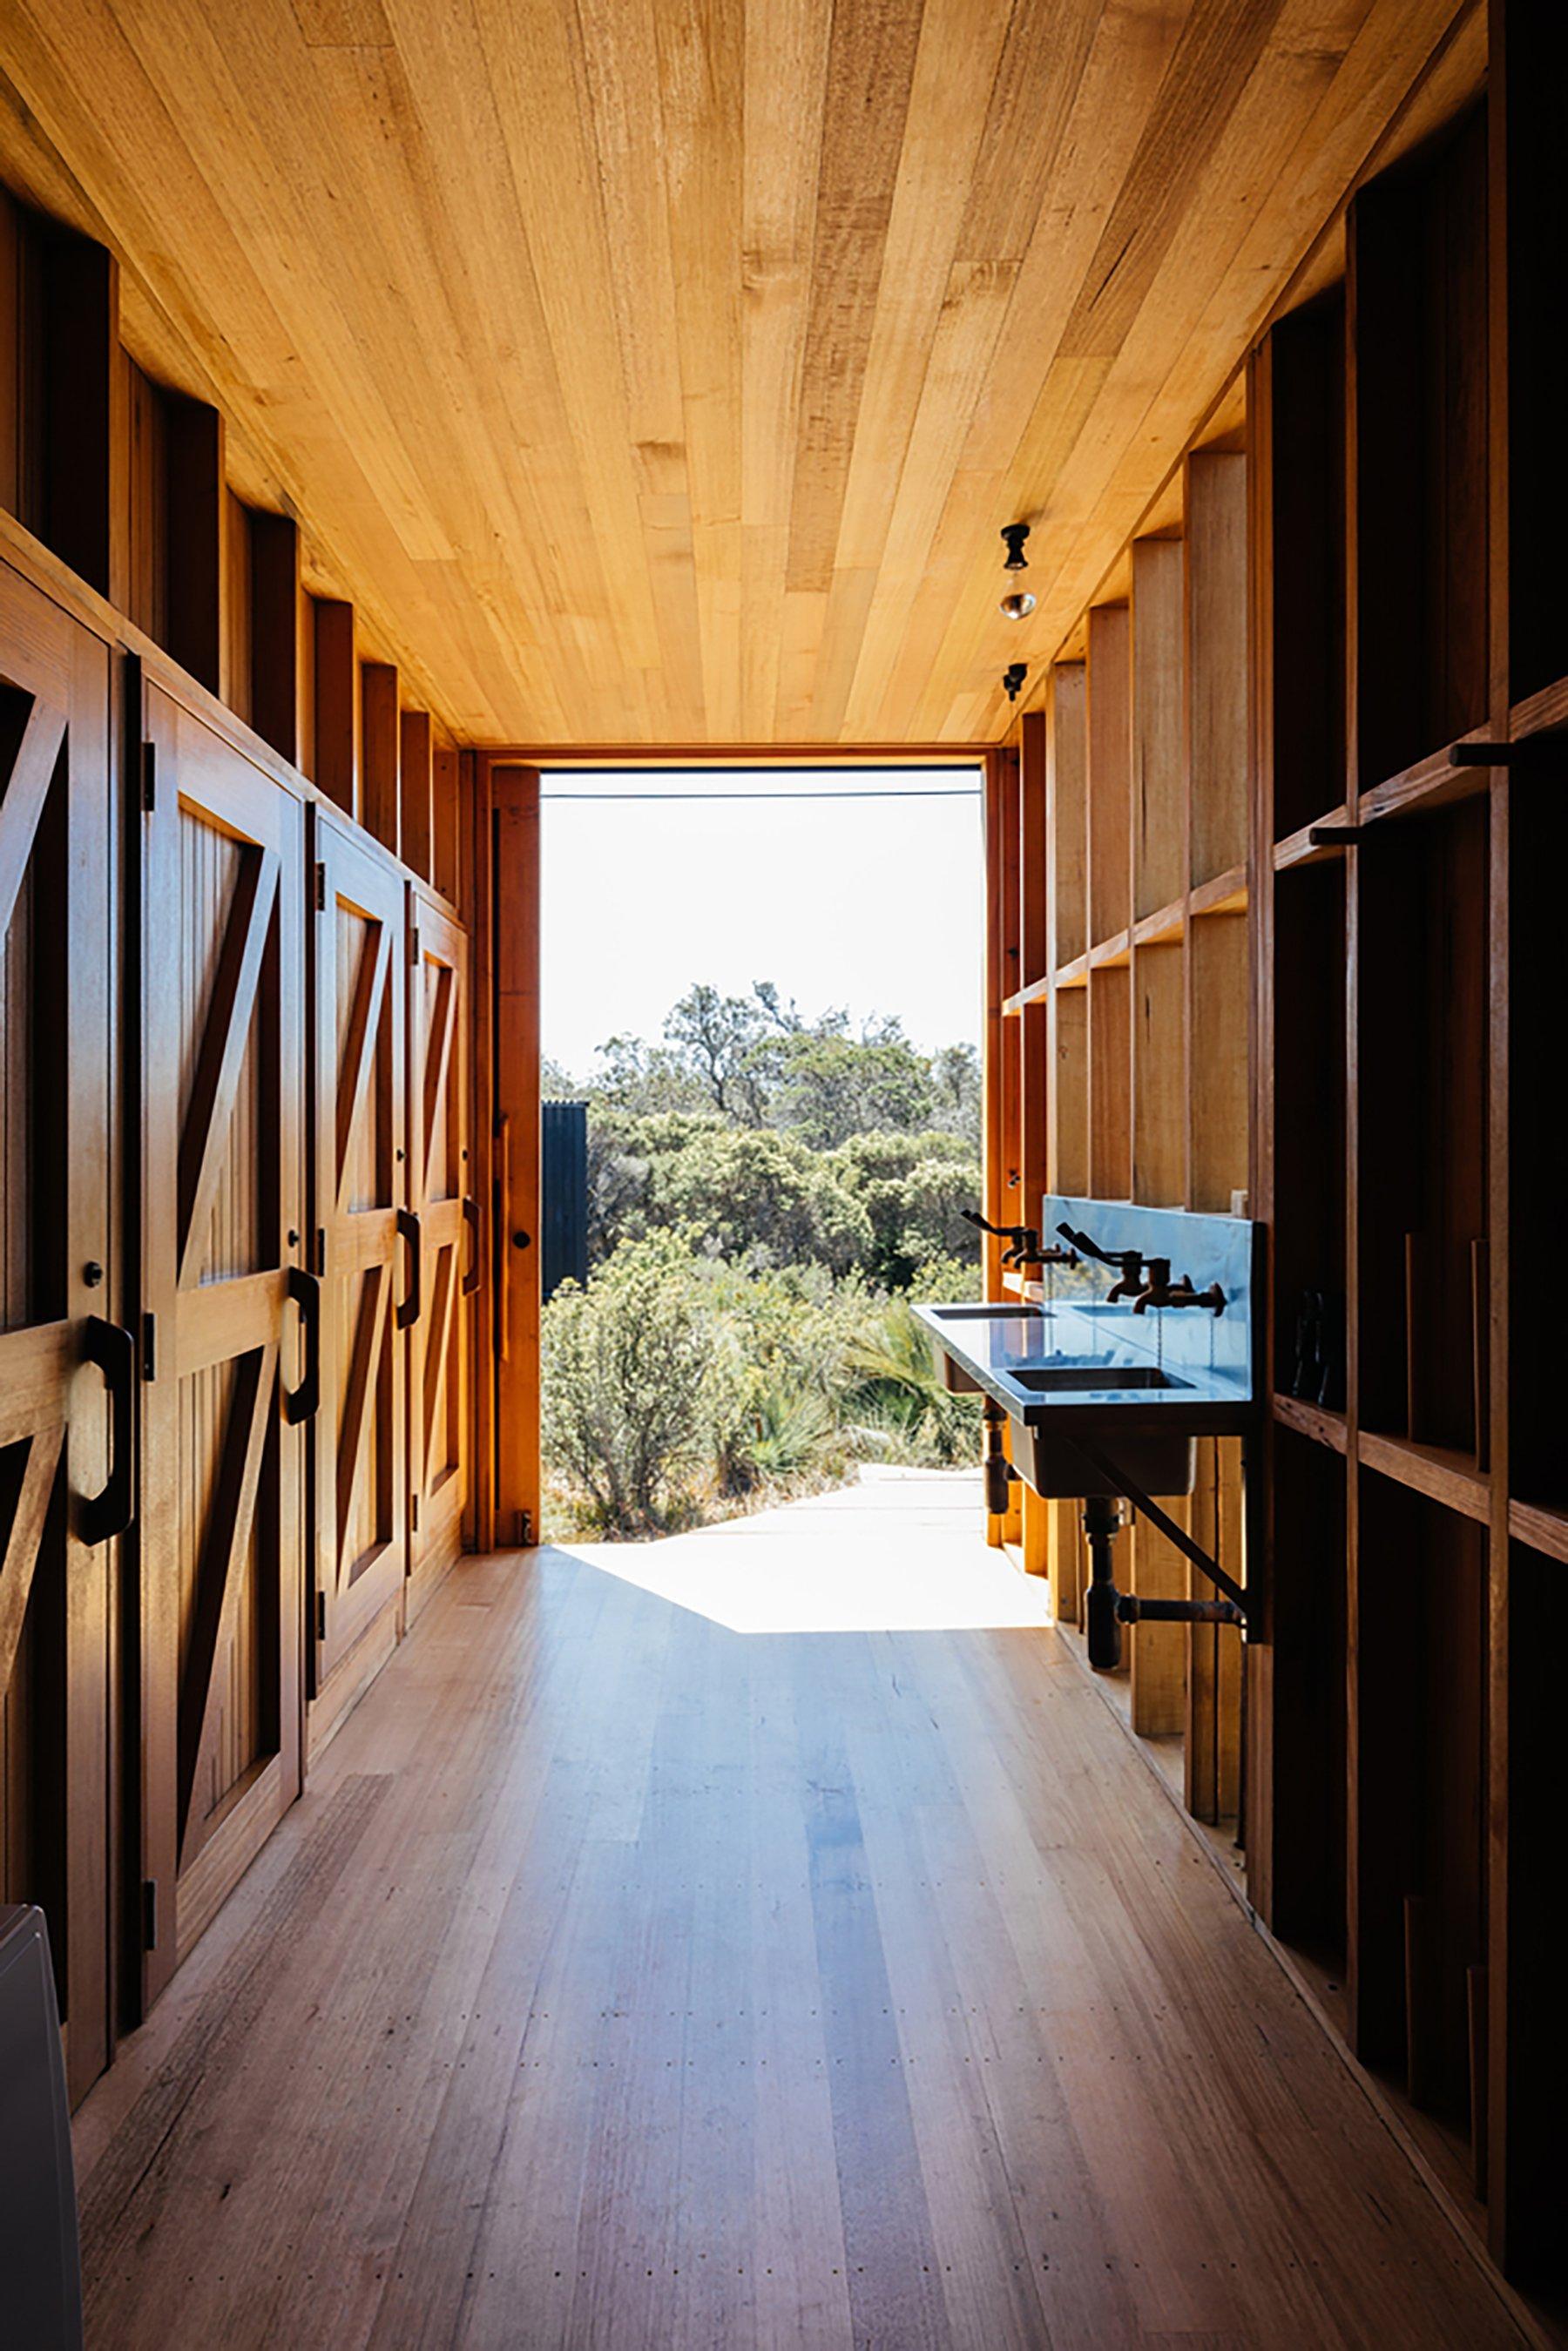 iGNANT-Architecture-Taylor-Hinds-Krakani-Lumi-011